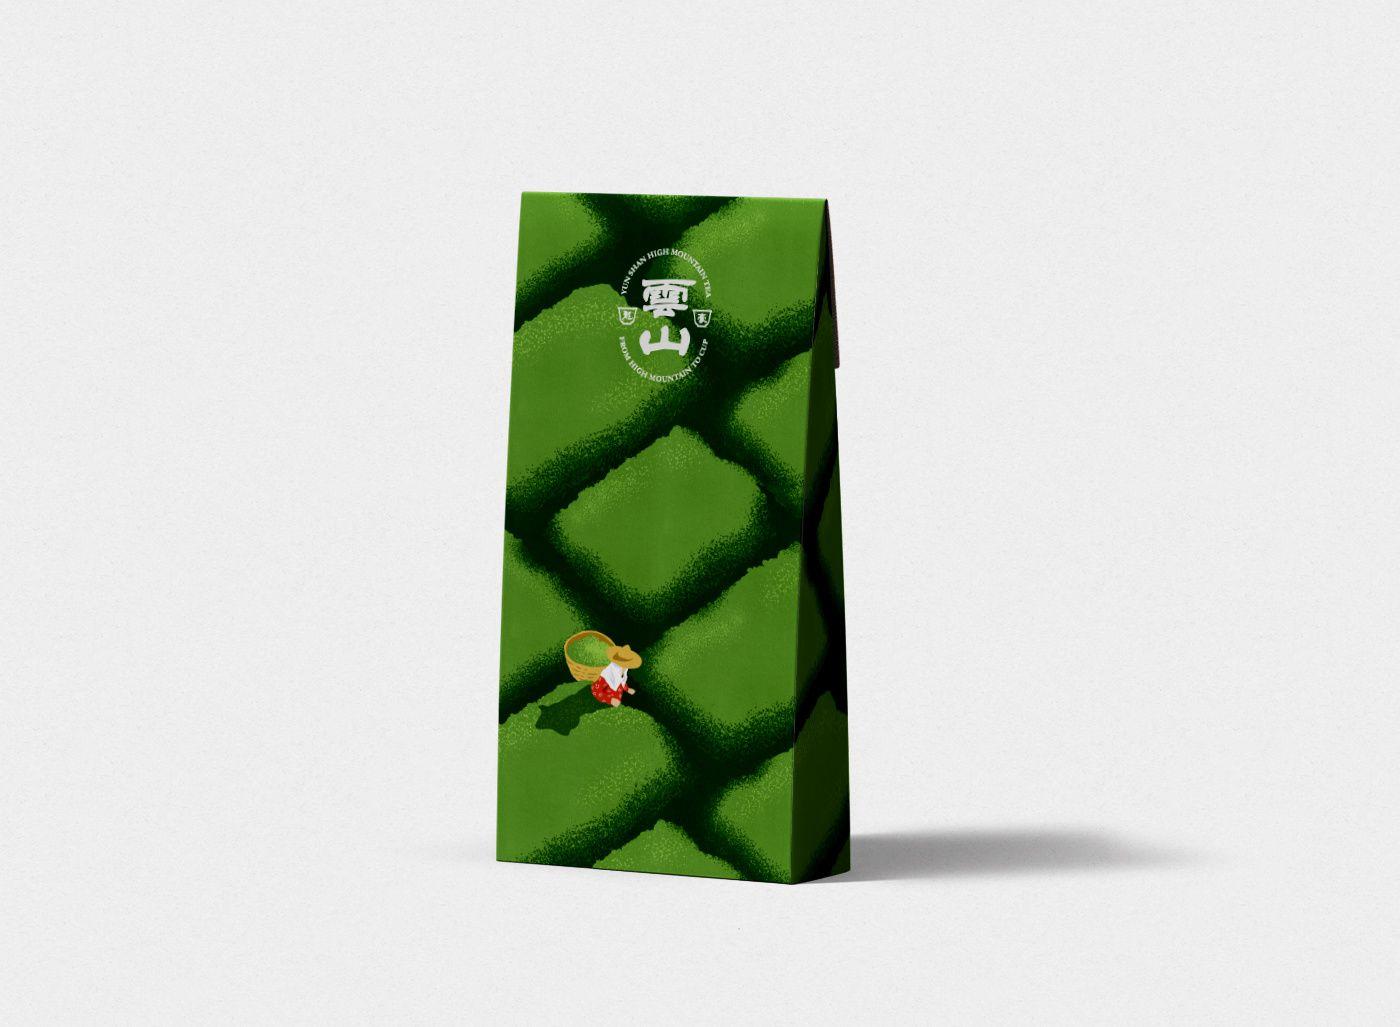 Yun Shan Tea (thé) I Design (concept) : Lung-Hao Chiang, Taïwan (octobre 2019)